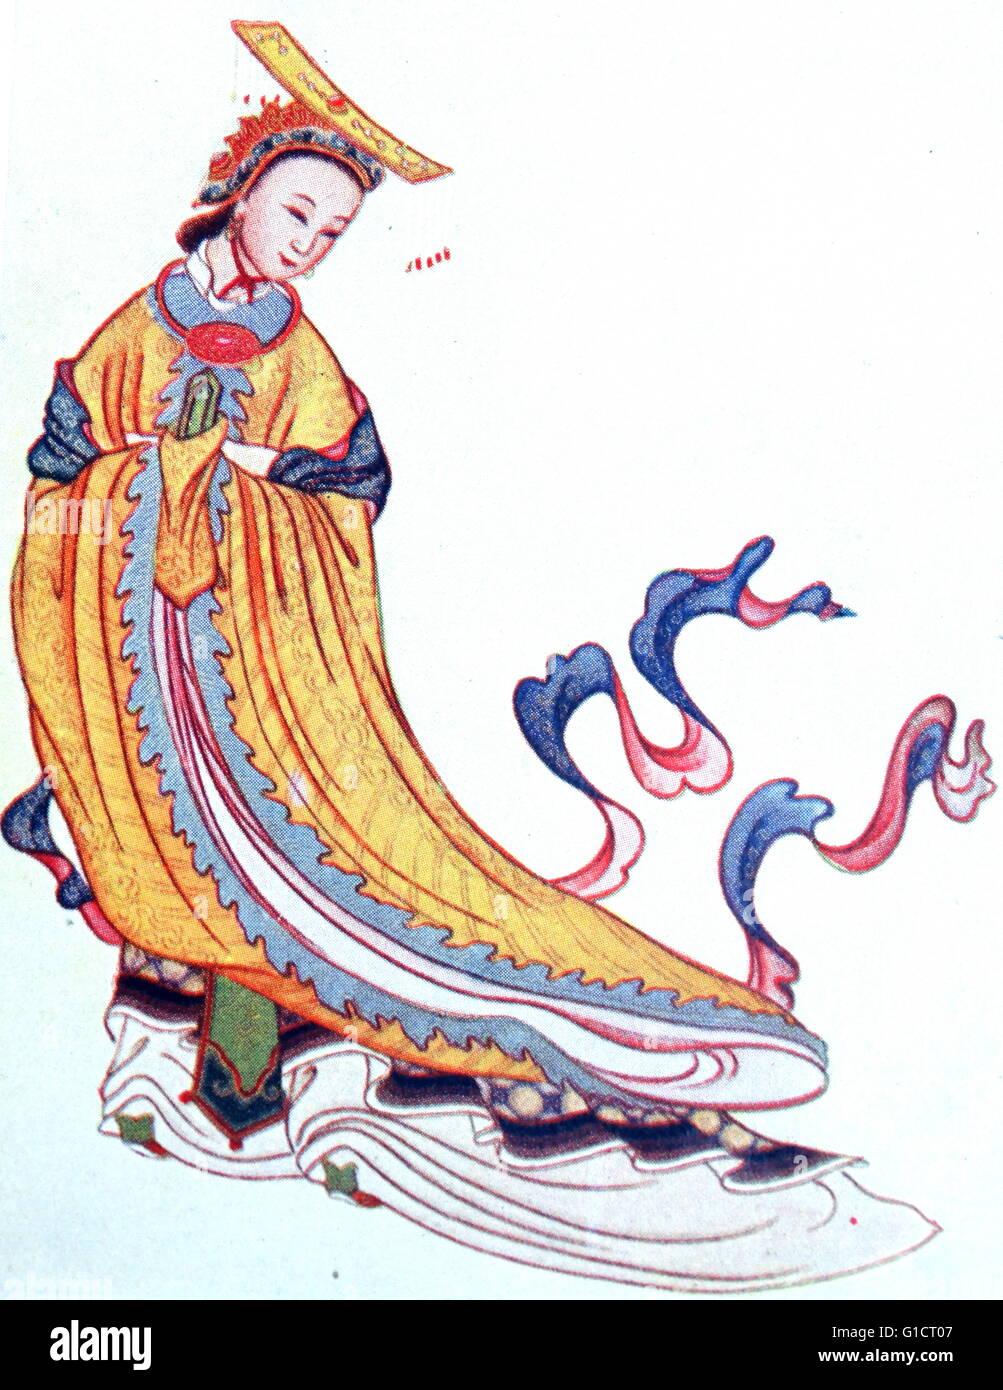 Illustration of Empress Chao Yang - Stock Image